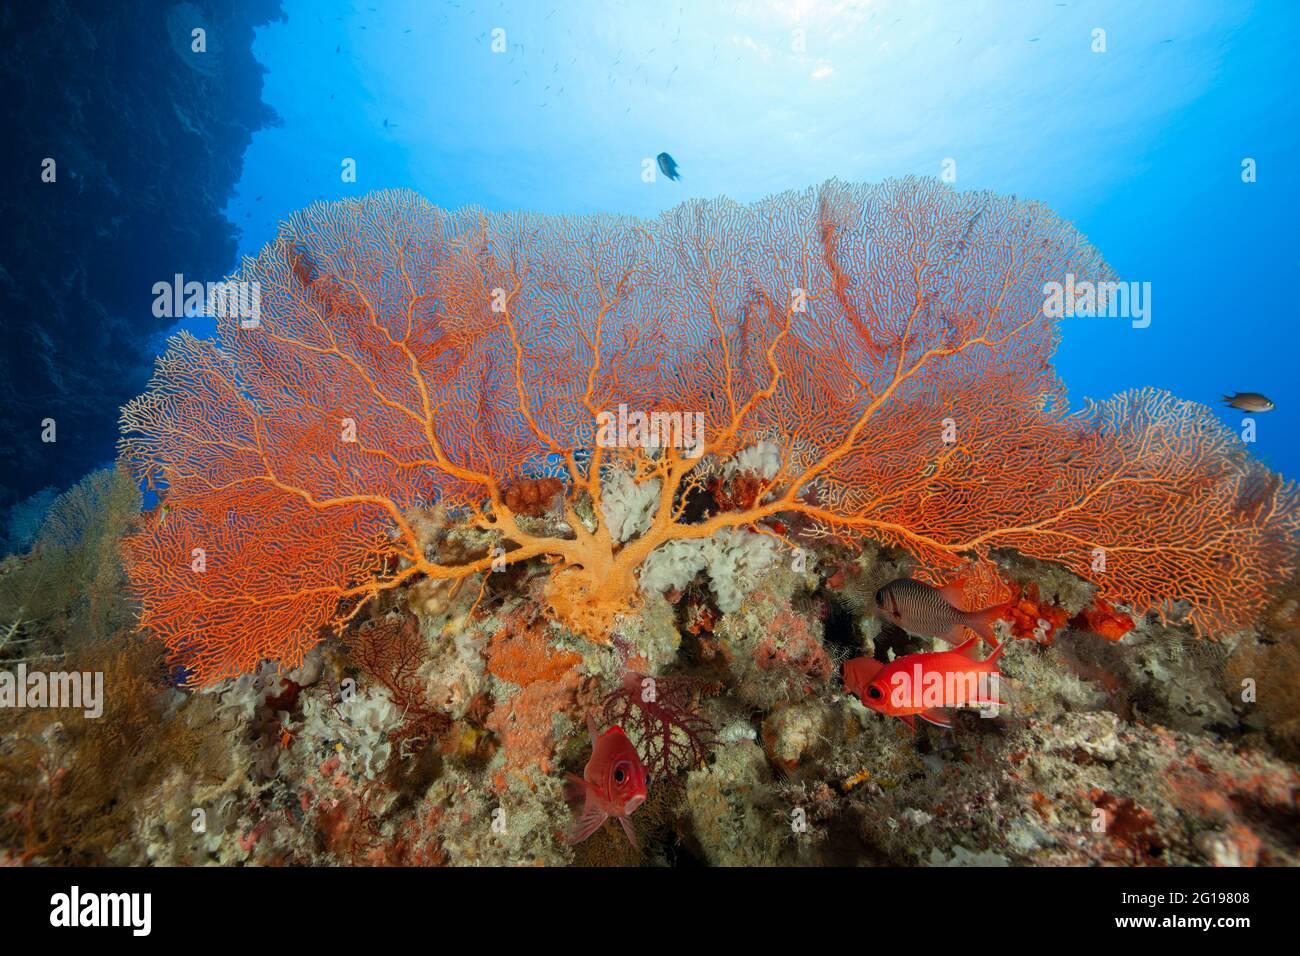 Soldierfishes Under Sea Fan, Annella mollis, Siaes Wall, Micronesia, Palau Foto de stock